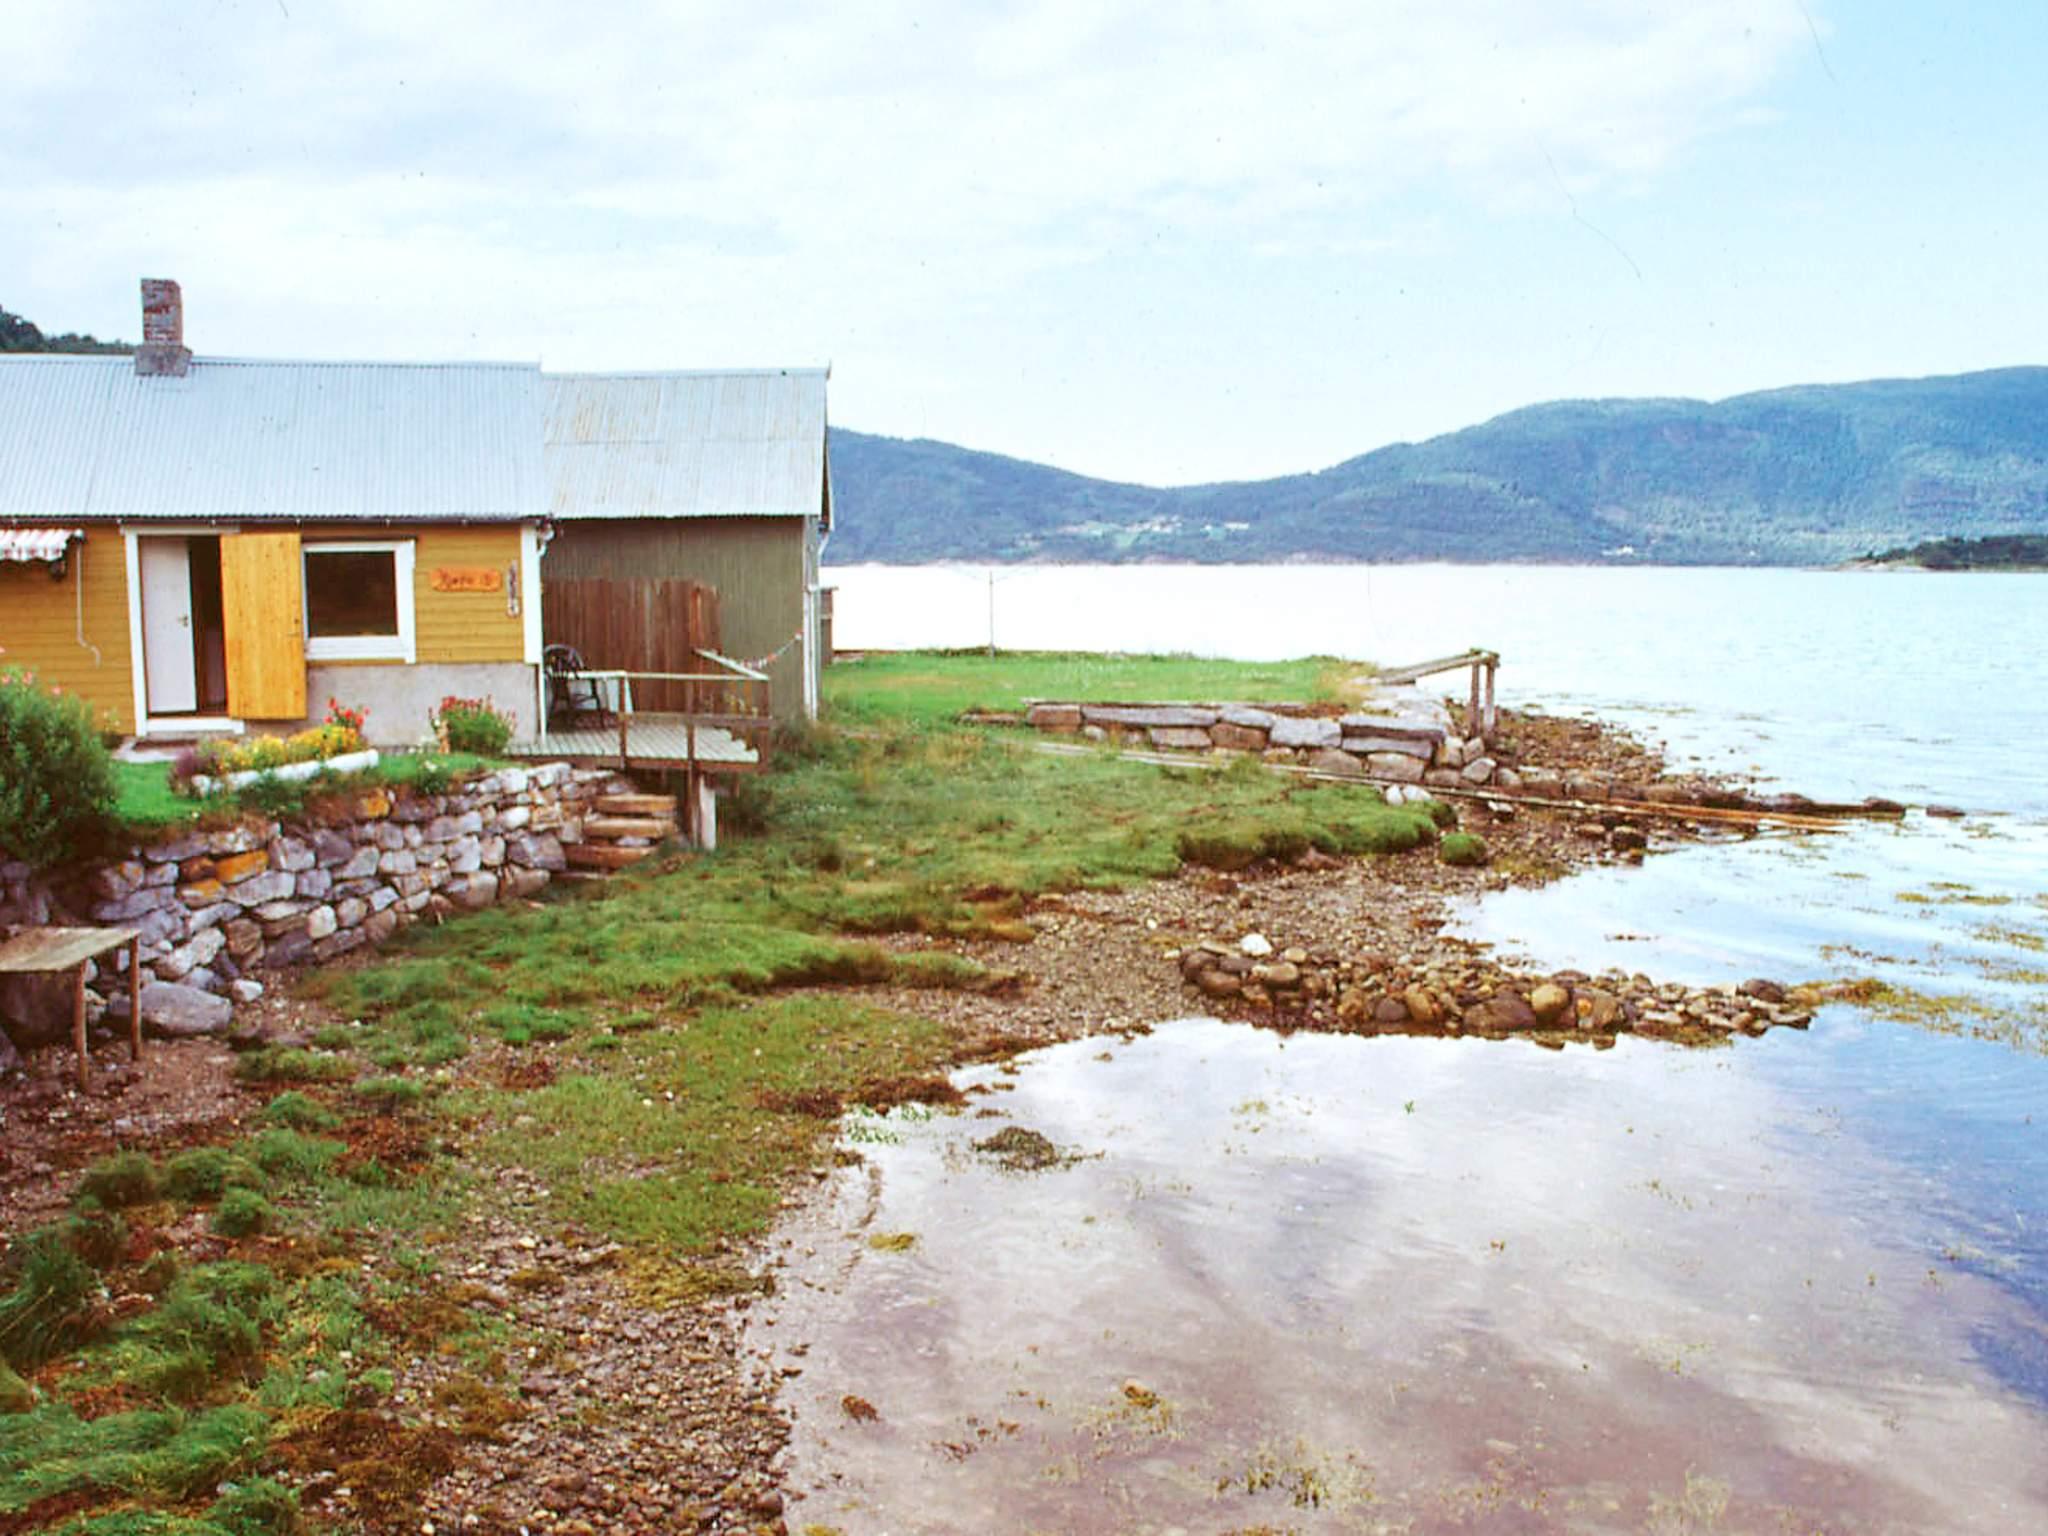 Ferienhaus Vistdal (85941), Vistdal, More - Romsdal, Westnorwegen, Norwegen, Bild 8